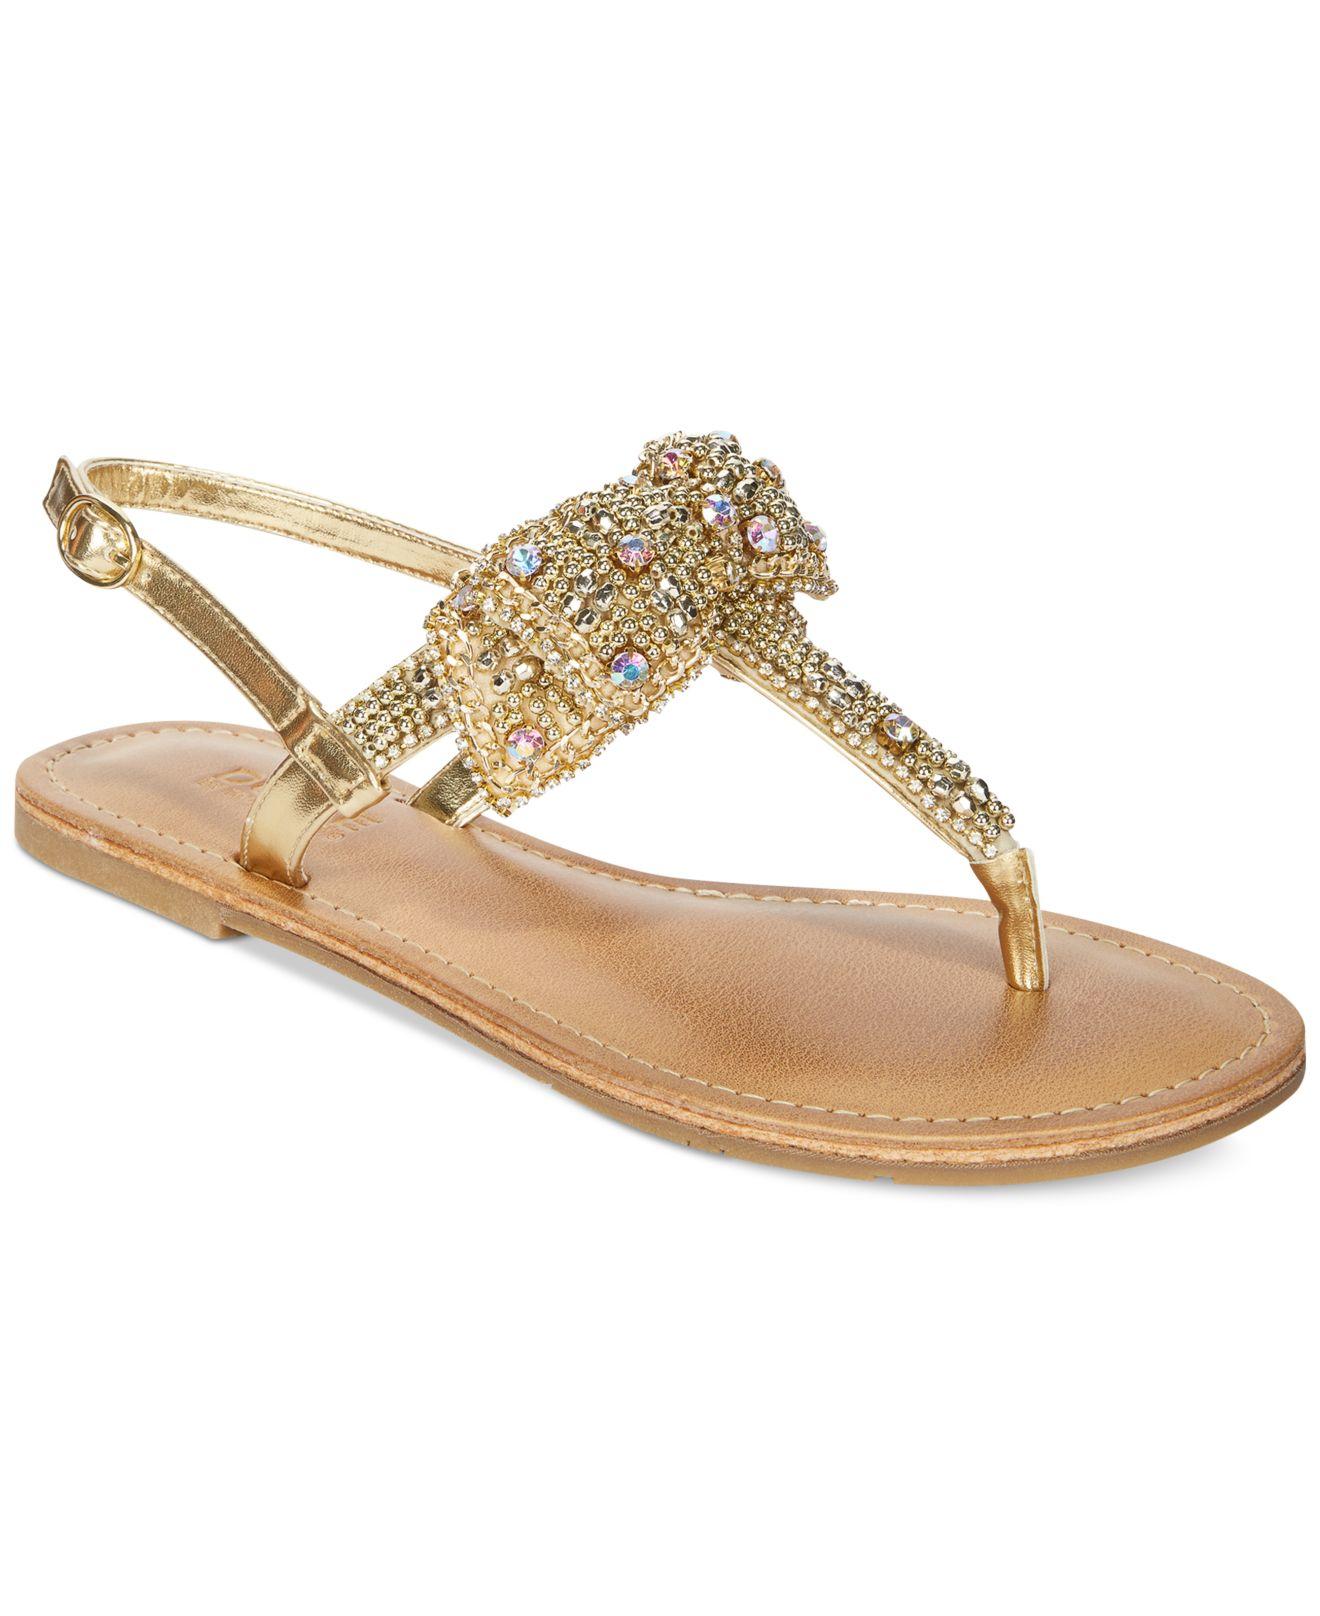 d08fd6641124ac Lyst - Mojo Moxy Dolce By Sienna Rhinestone Bow Flat Thong Sandals ...